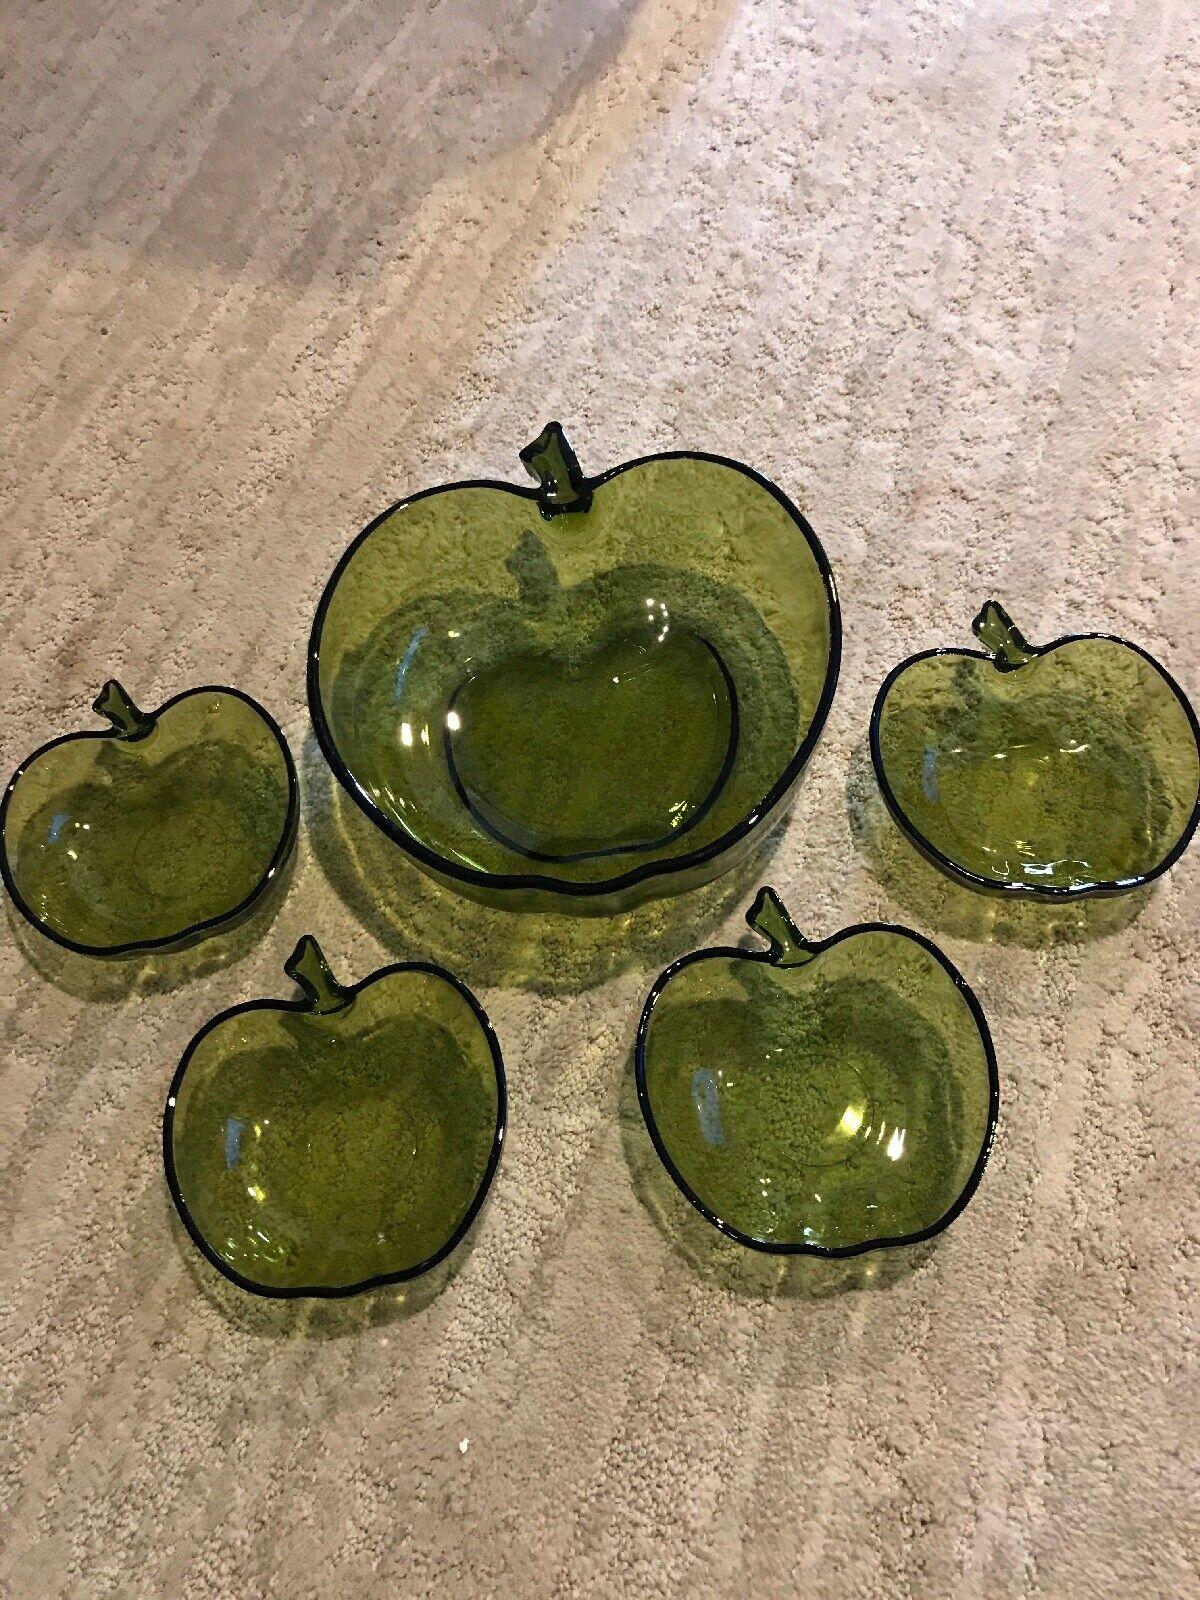 Hazel Atlas Green Apple Salad Serving Bowl With 4 Small Salad Bowls For Sale Online Ebay